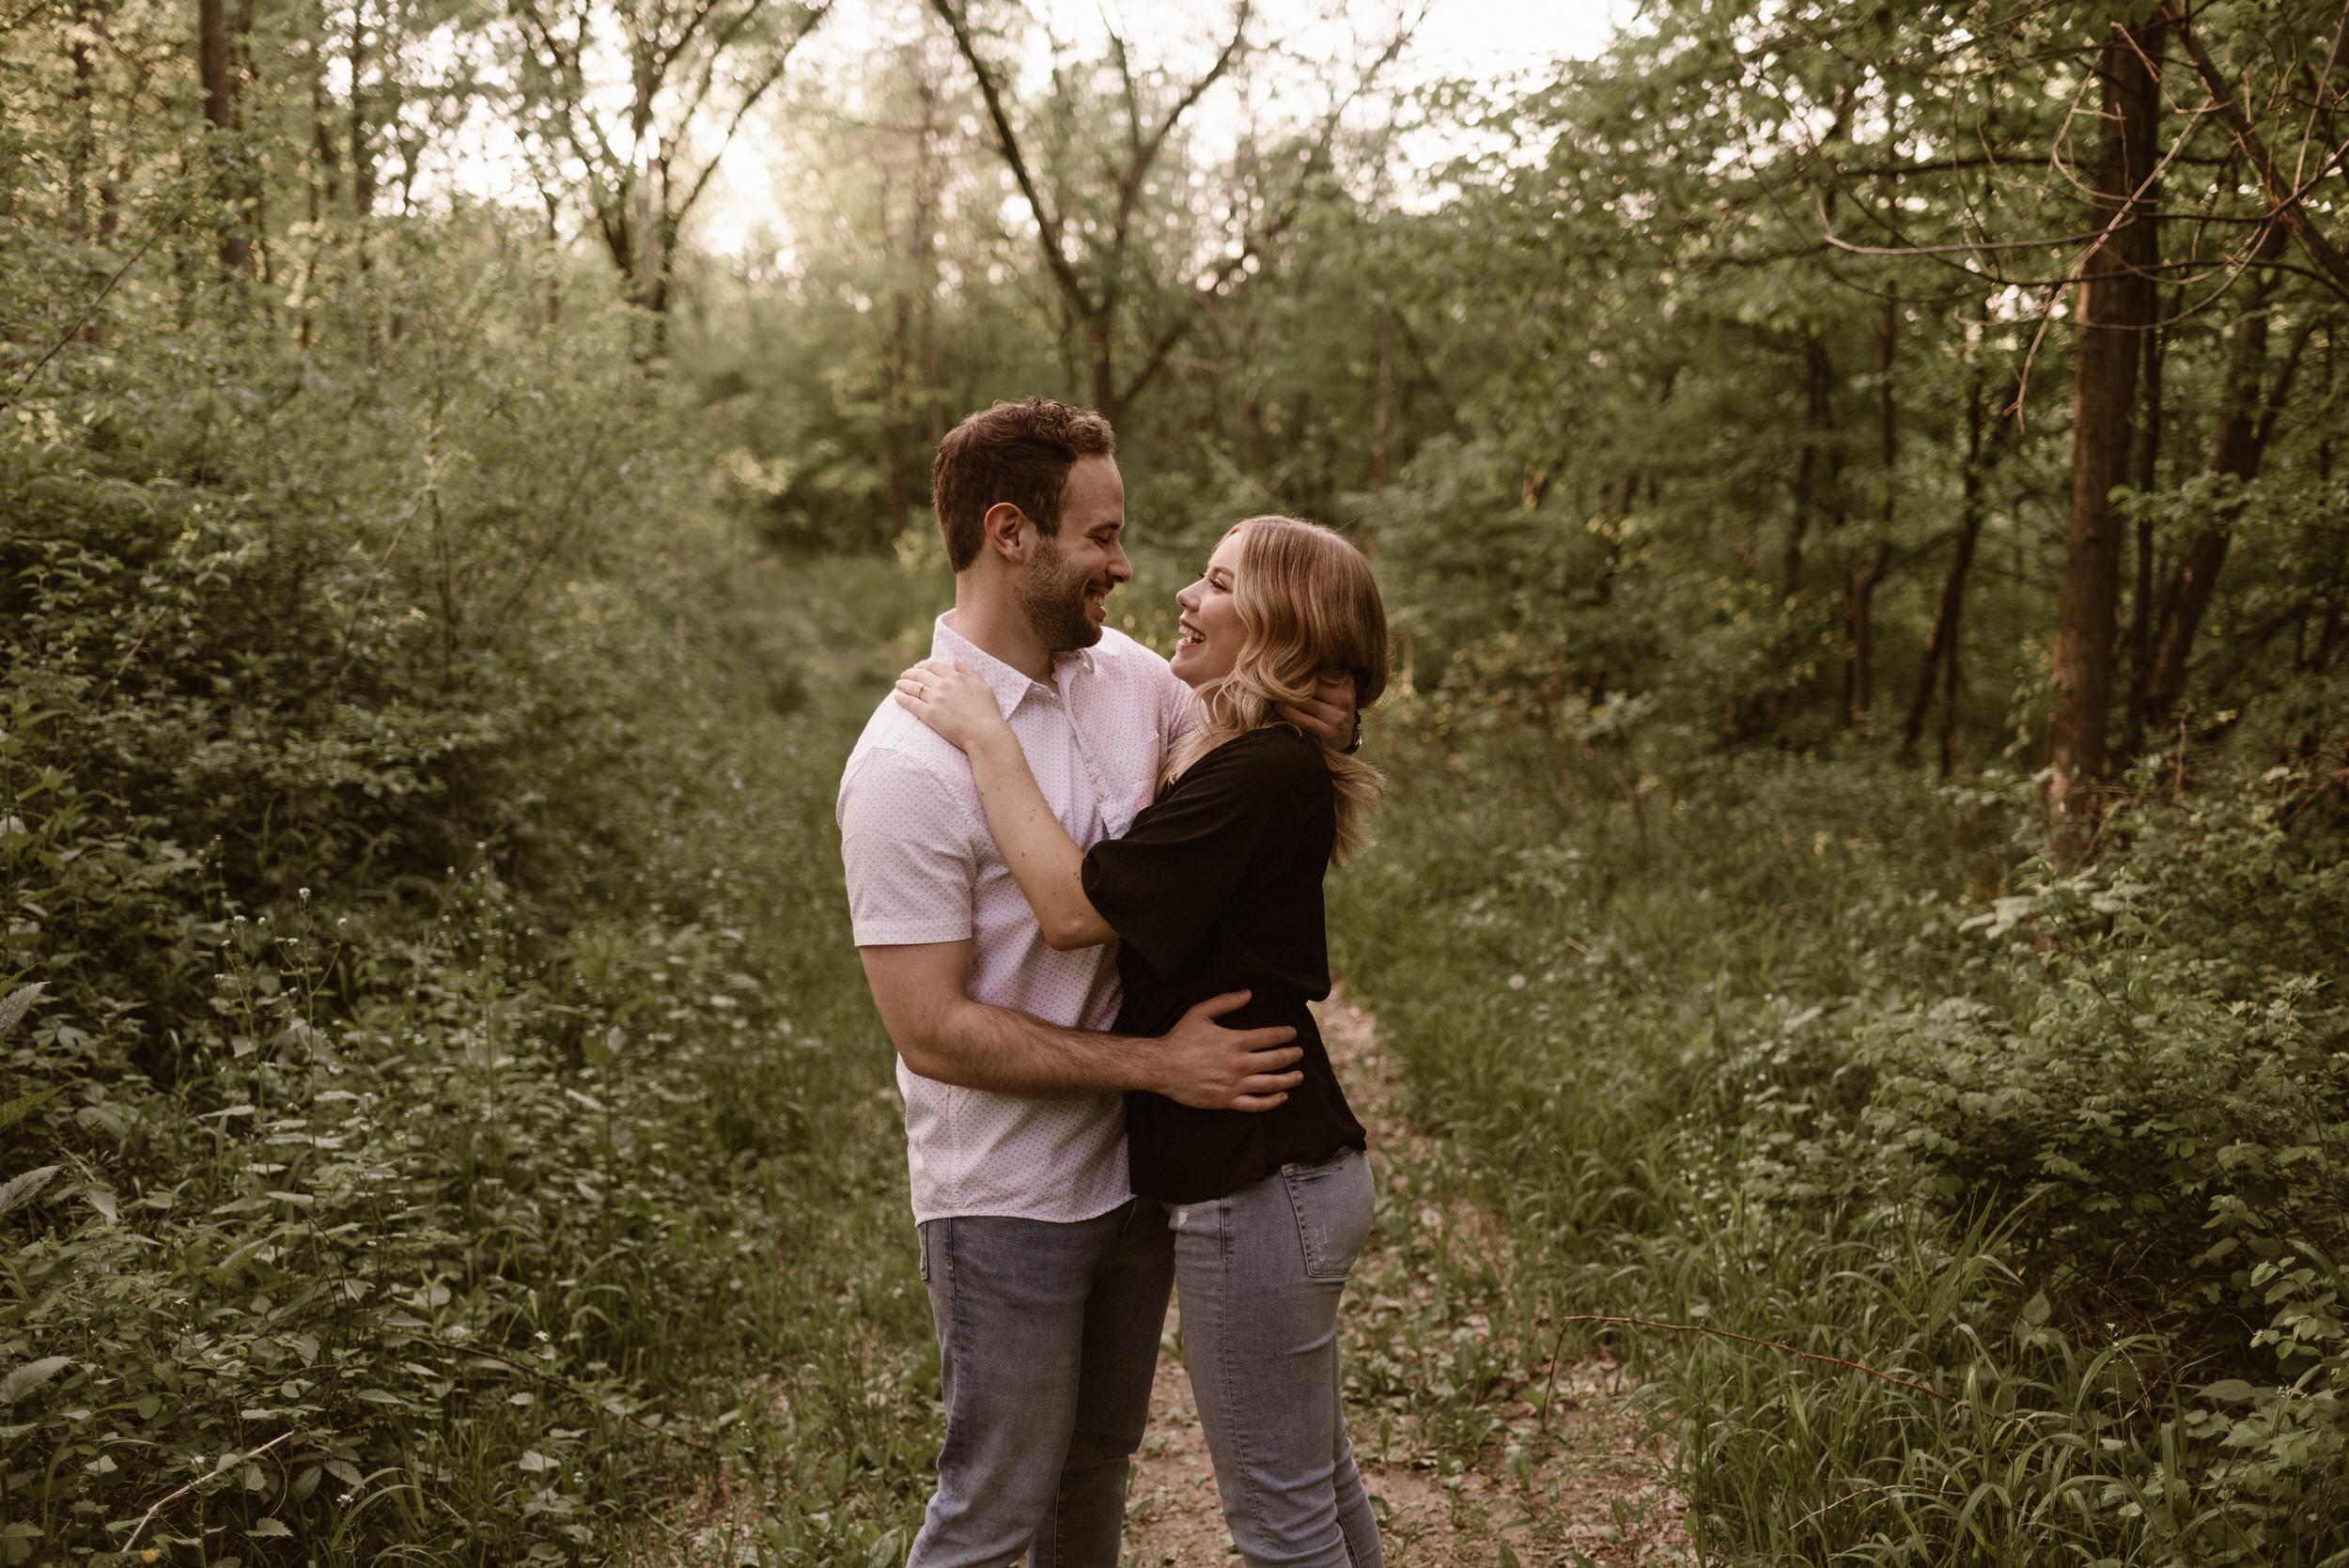 Omaha-Nebraska-Engagement-Session-Kaylie-Sirek-Photography-101.jpg